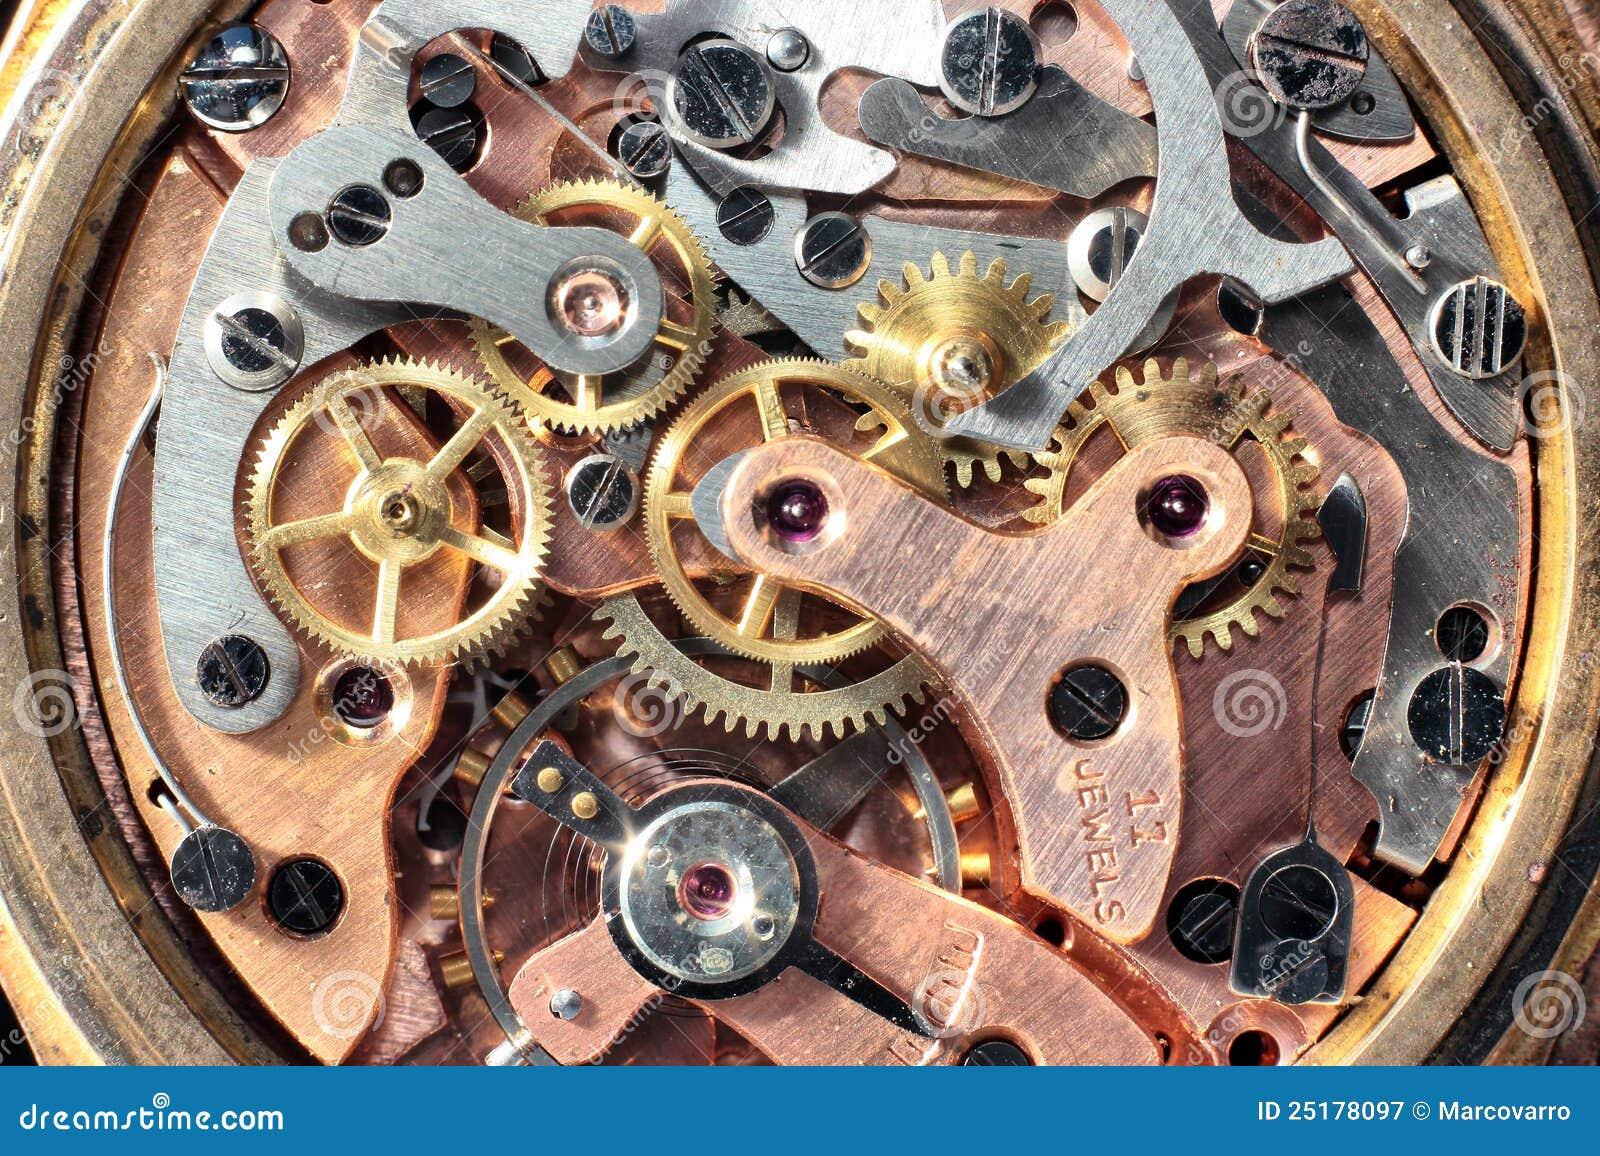 vintage clockwork royalty free stock photography image robot clipart images robot clipart images